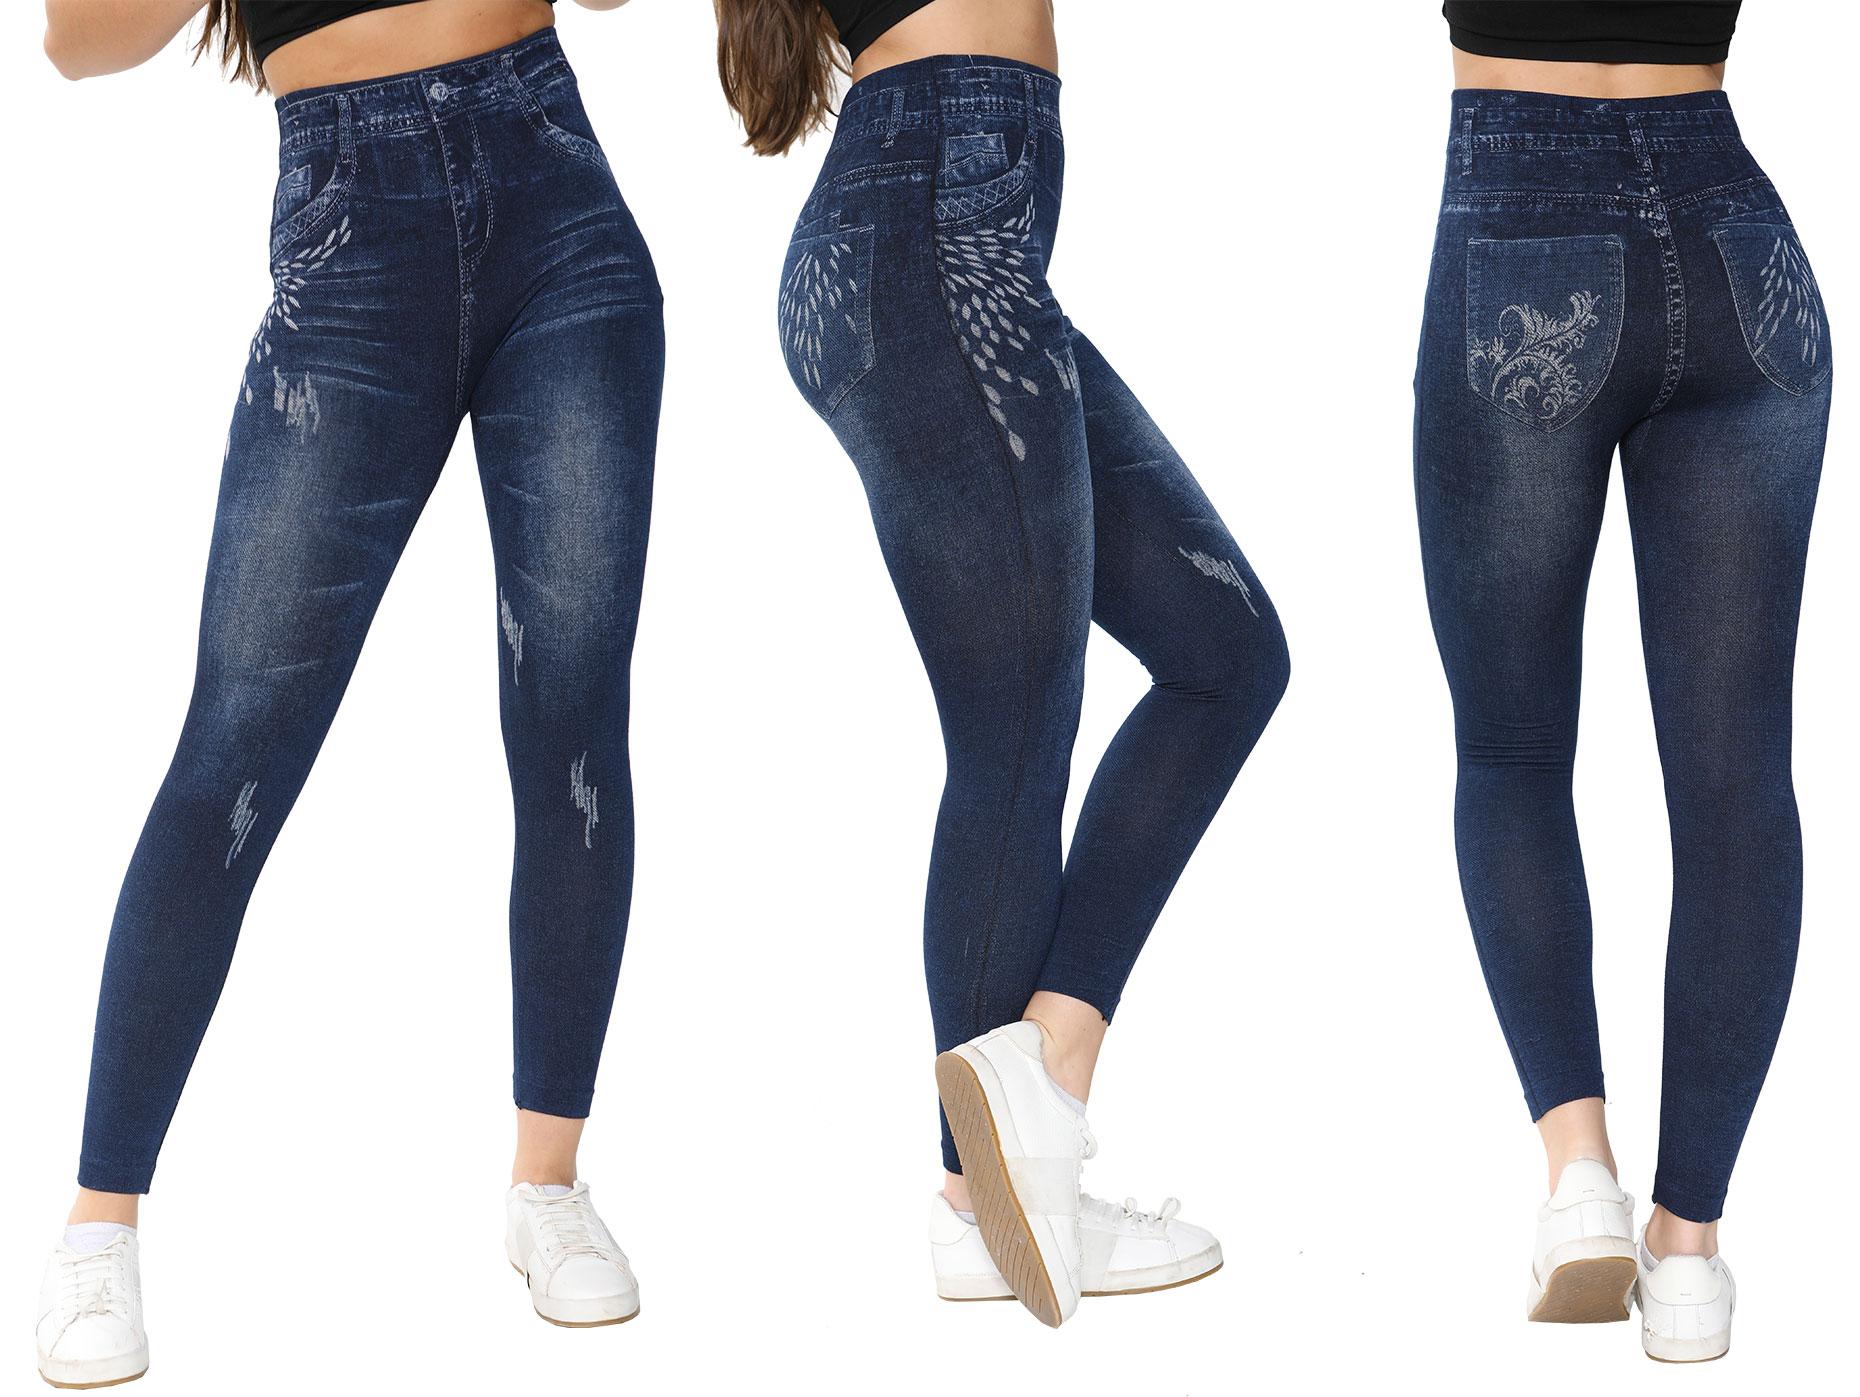 Ladies Denim Fashion Leggings